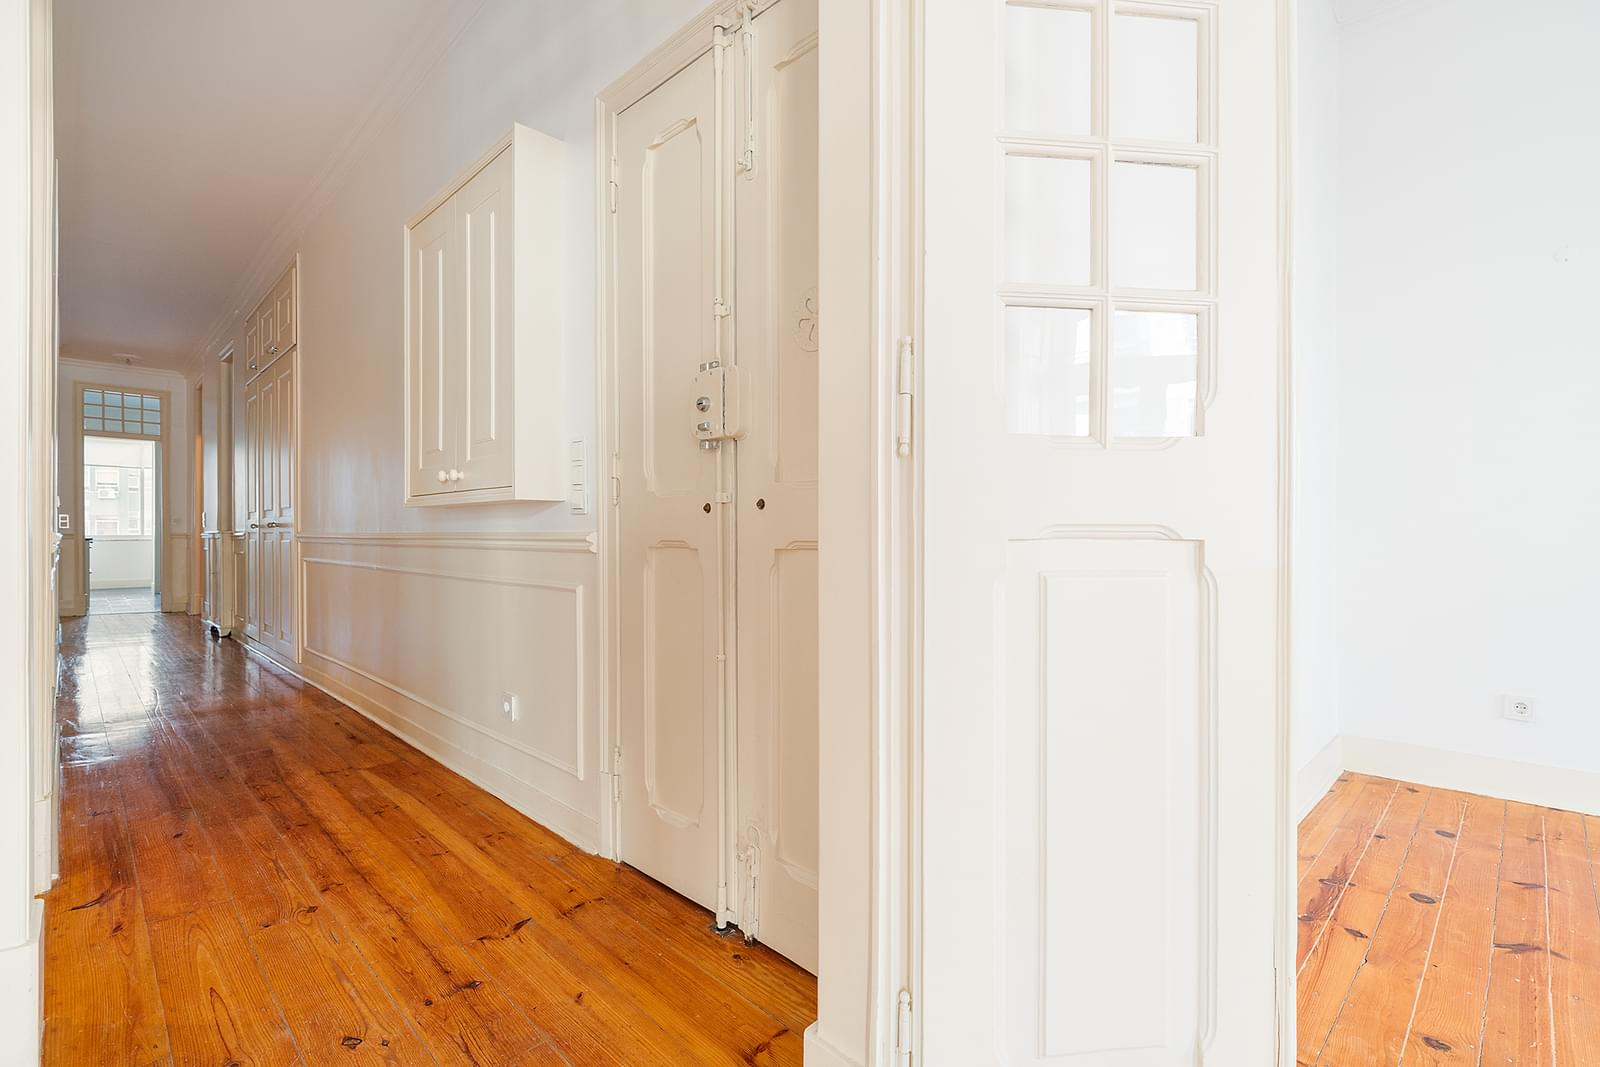 pf18723-apartamento-t3-1-lisboa-420e97af-dca2-4141-aa63-0335caed1c3e